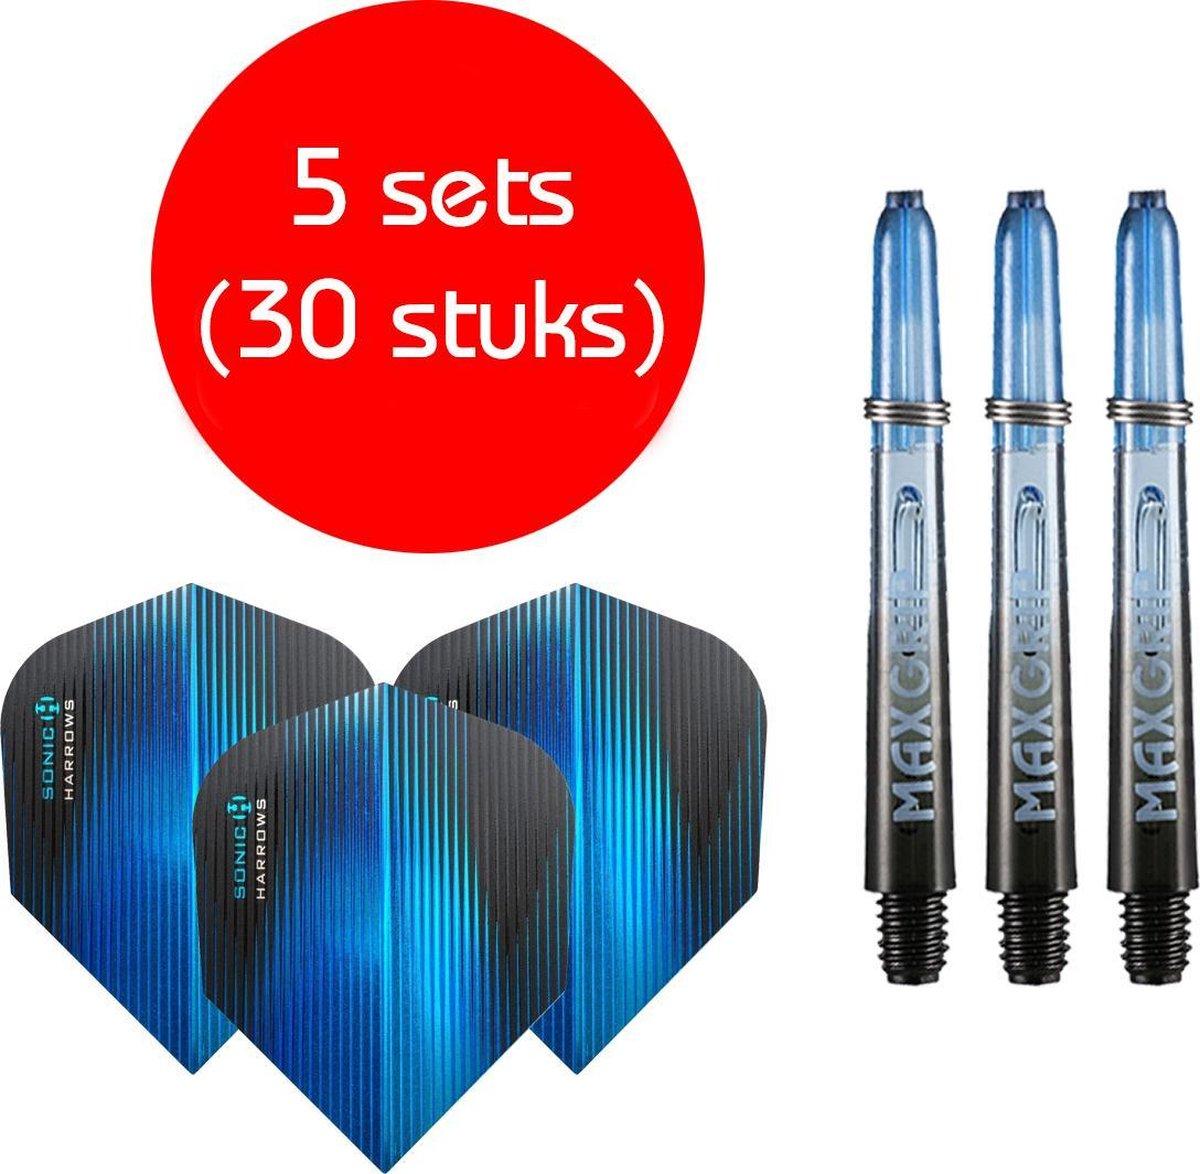 Dragon darts - Maxgrip - 5 sets - darts shafts - zwart-blauw - short - en 5 sets - Sonic blauw - darts flights